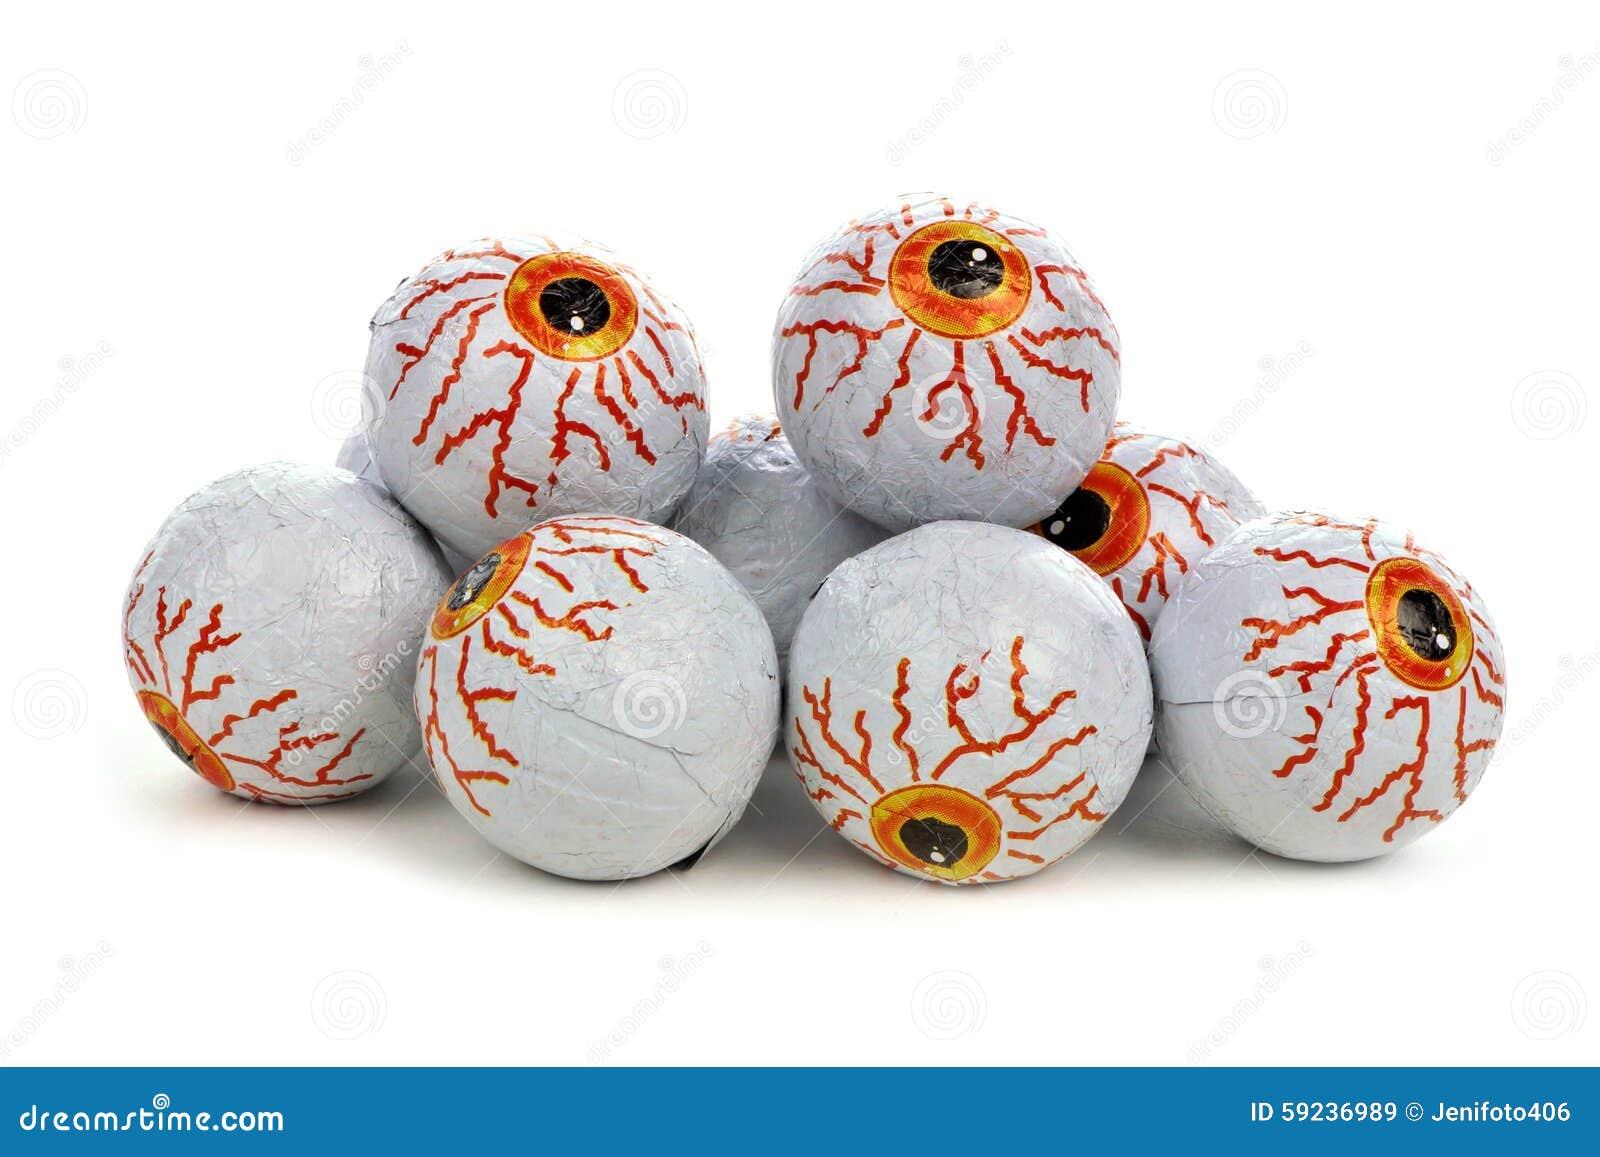 Pile Of Halloween Candy Eyeballs Over White Stock Image ...